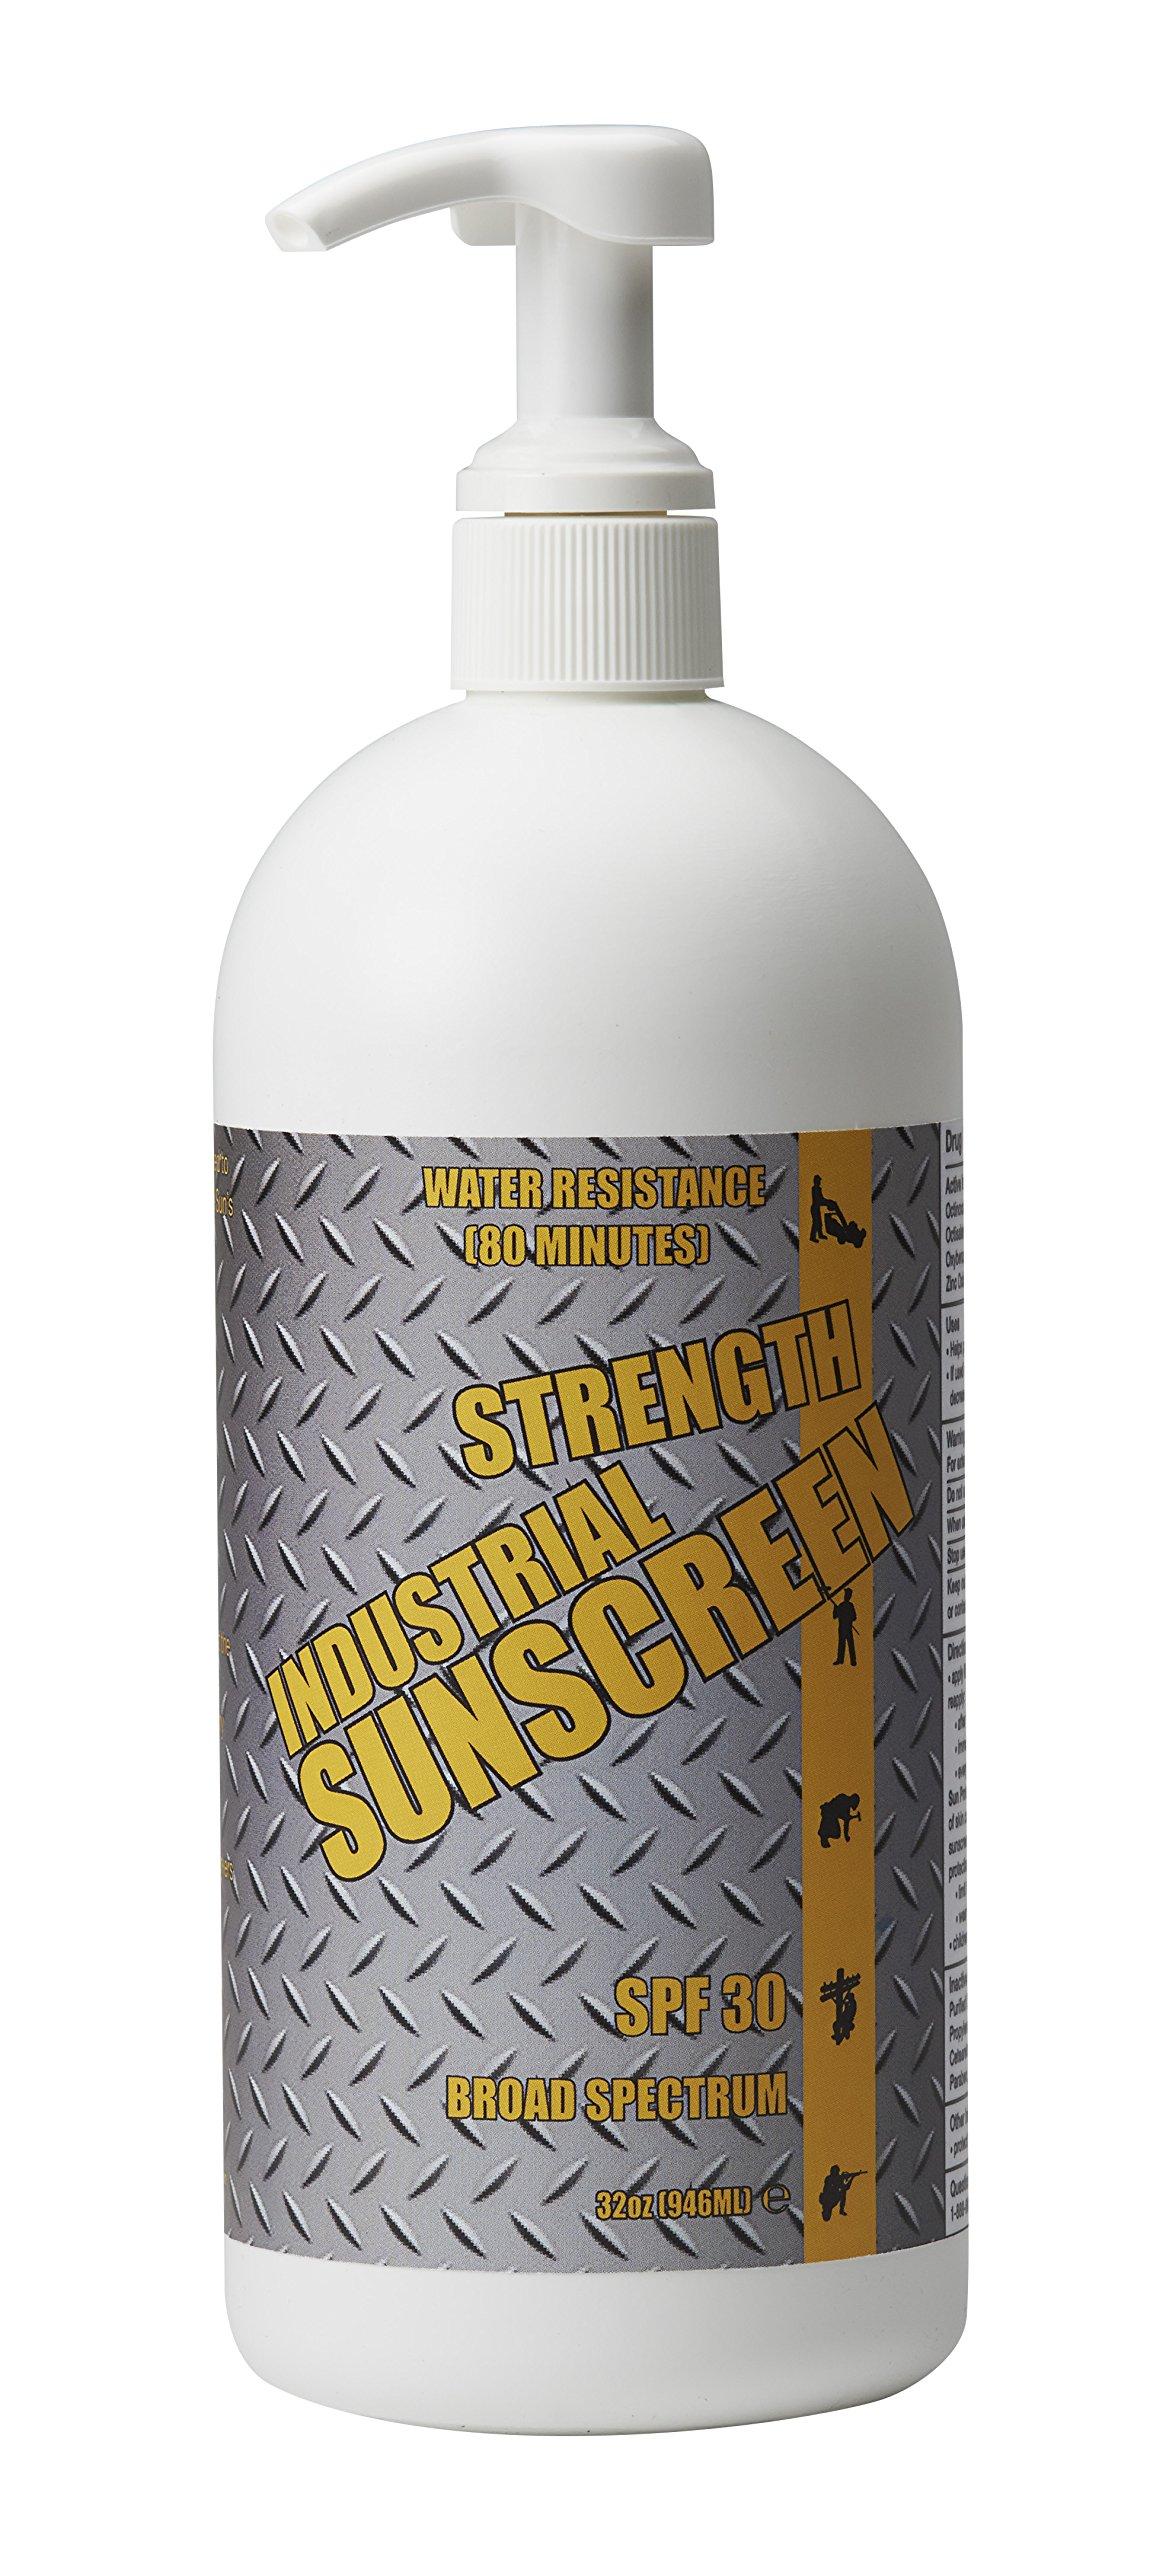 Industrial Sunscreen SPF30+ Broad Spectrum 80 Min. Water Resistance Zinc Oxide Formulation 32 oz.